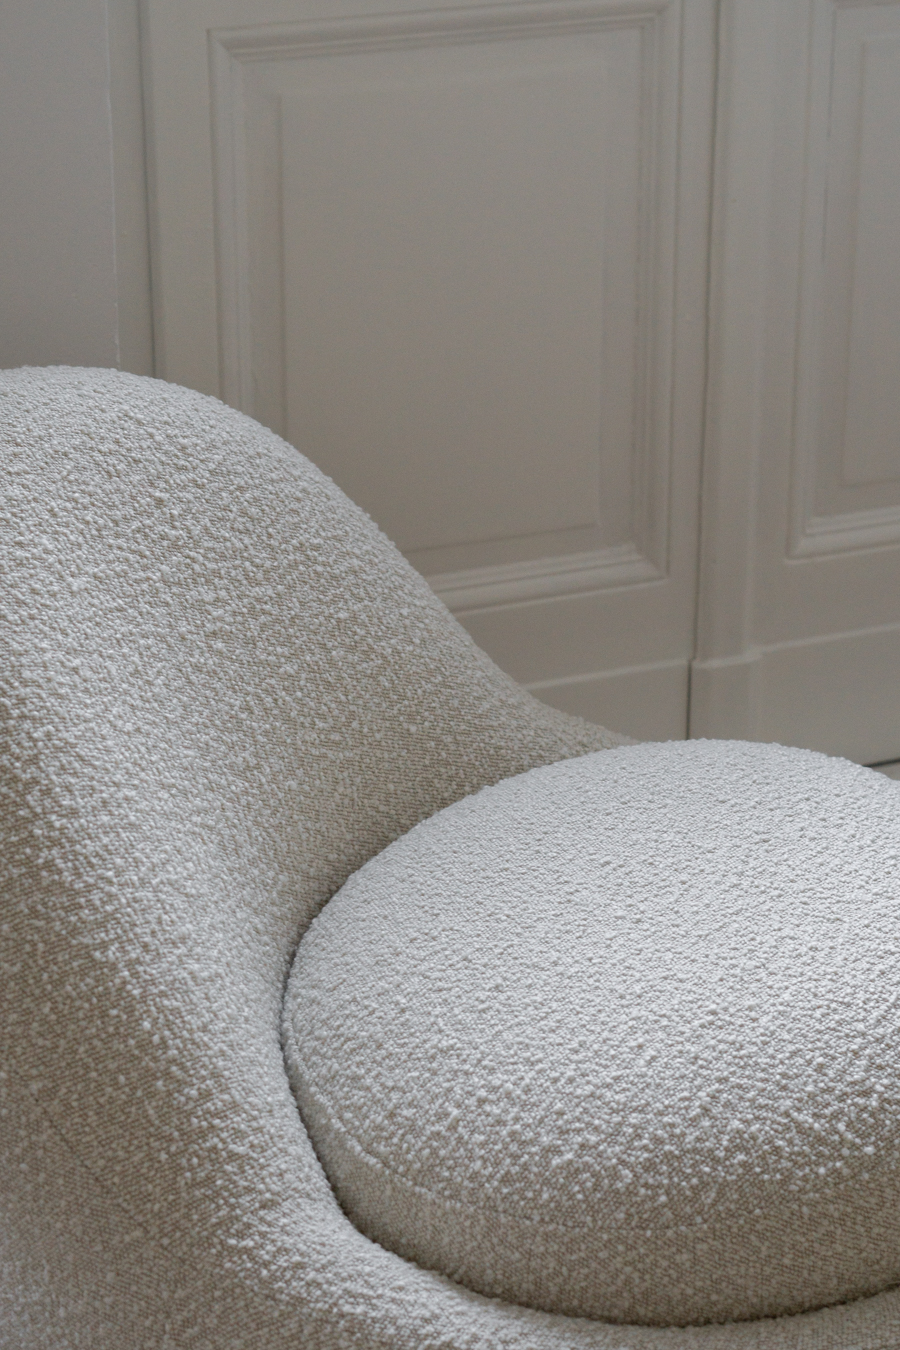 SOFACOMPANY, Maya Cream Boucle, Beige Interior Aesthetic